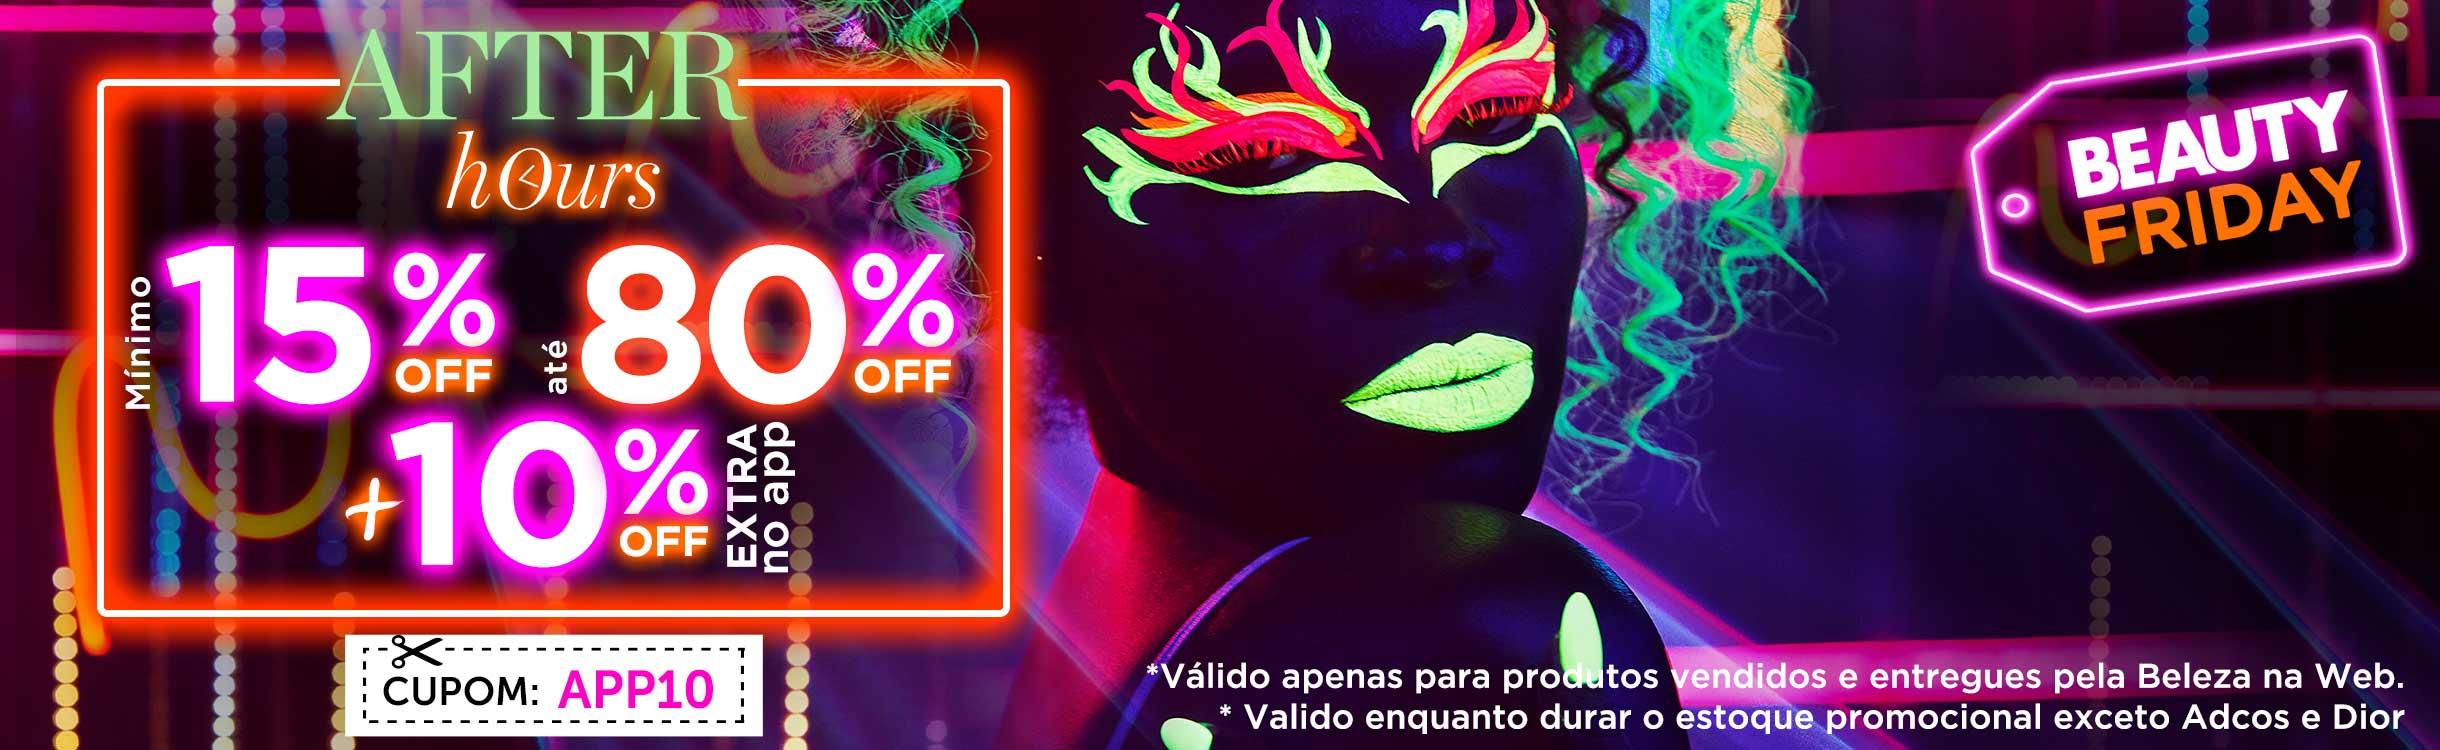 Beauty Friday | Desconto Extra Exclusivo no App